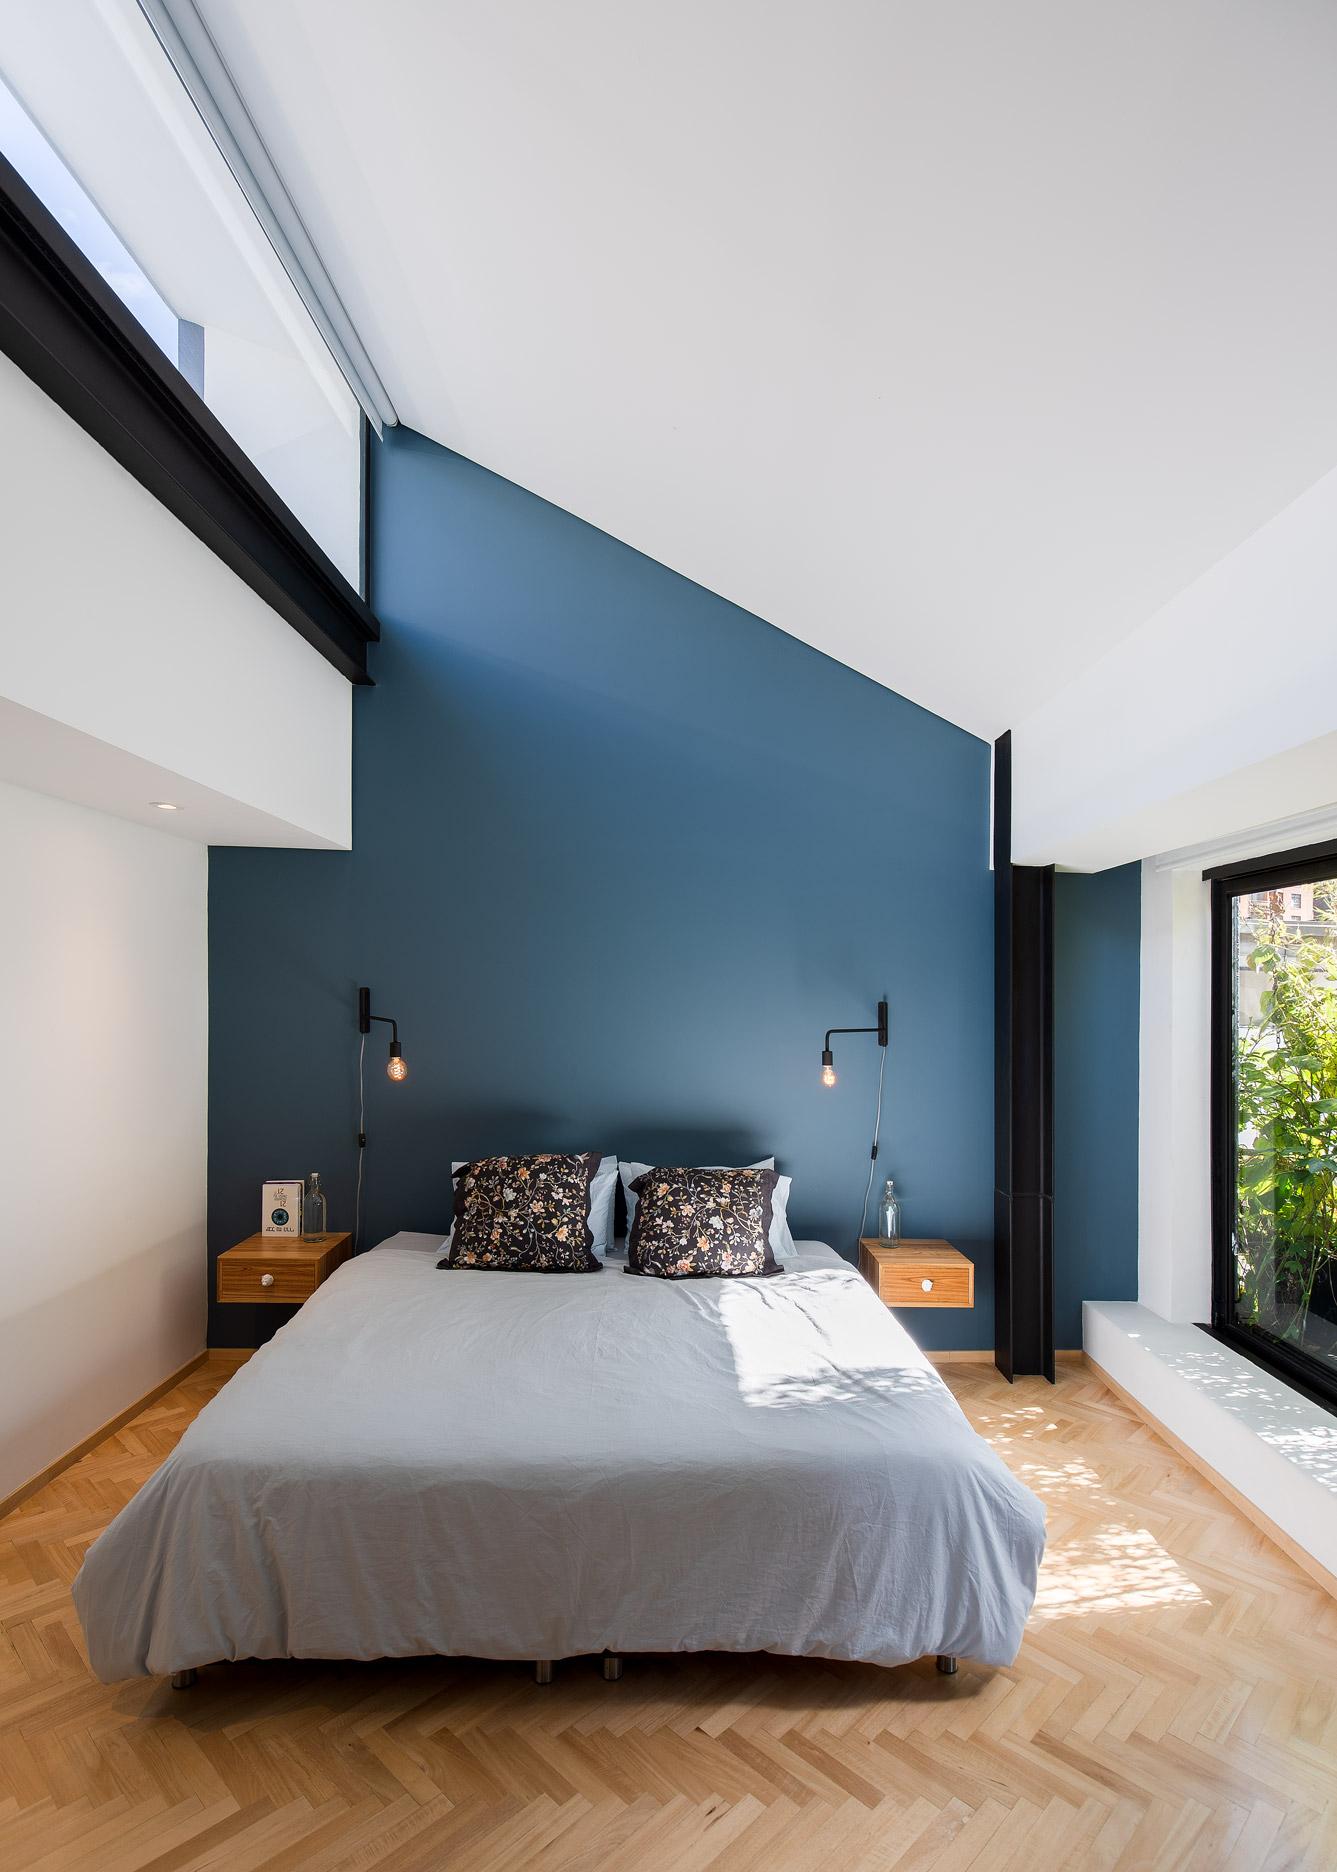 04.oberlaenderarquitectos.arquitectura.simonboschphotography.simon.bosch.bogota.interior.habitar